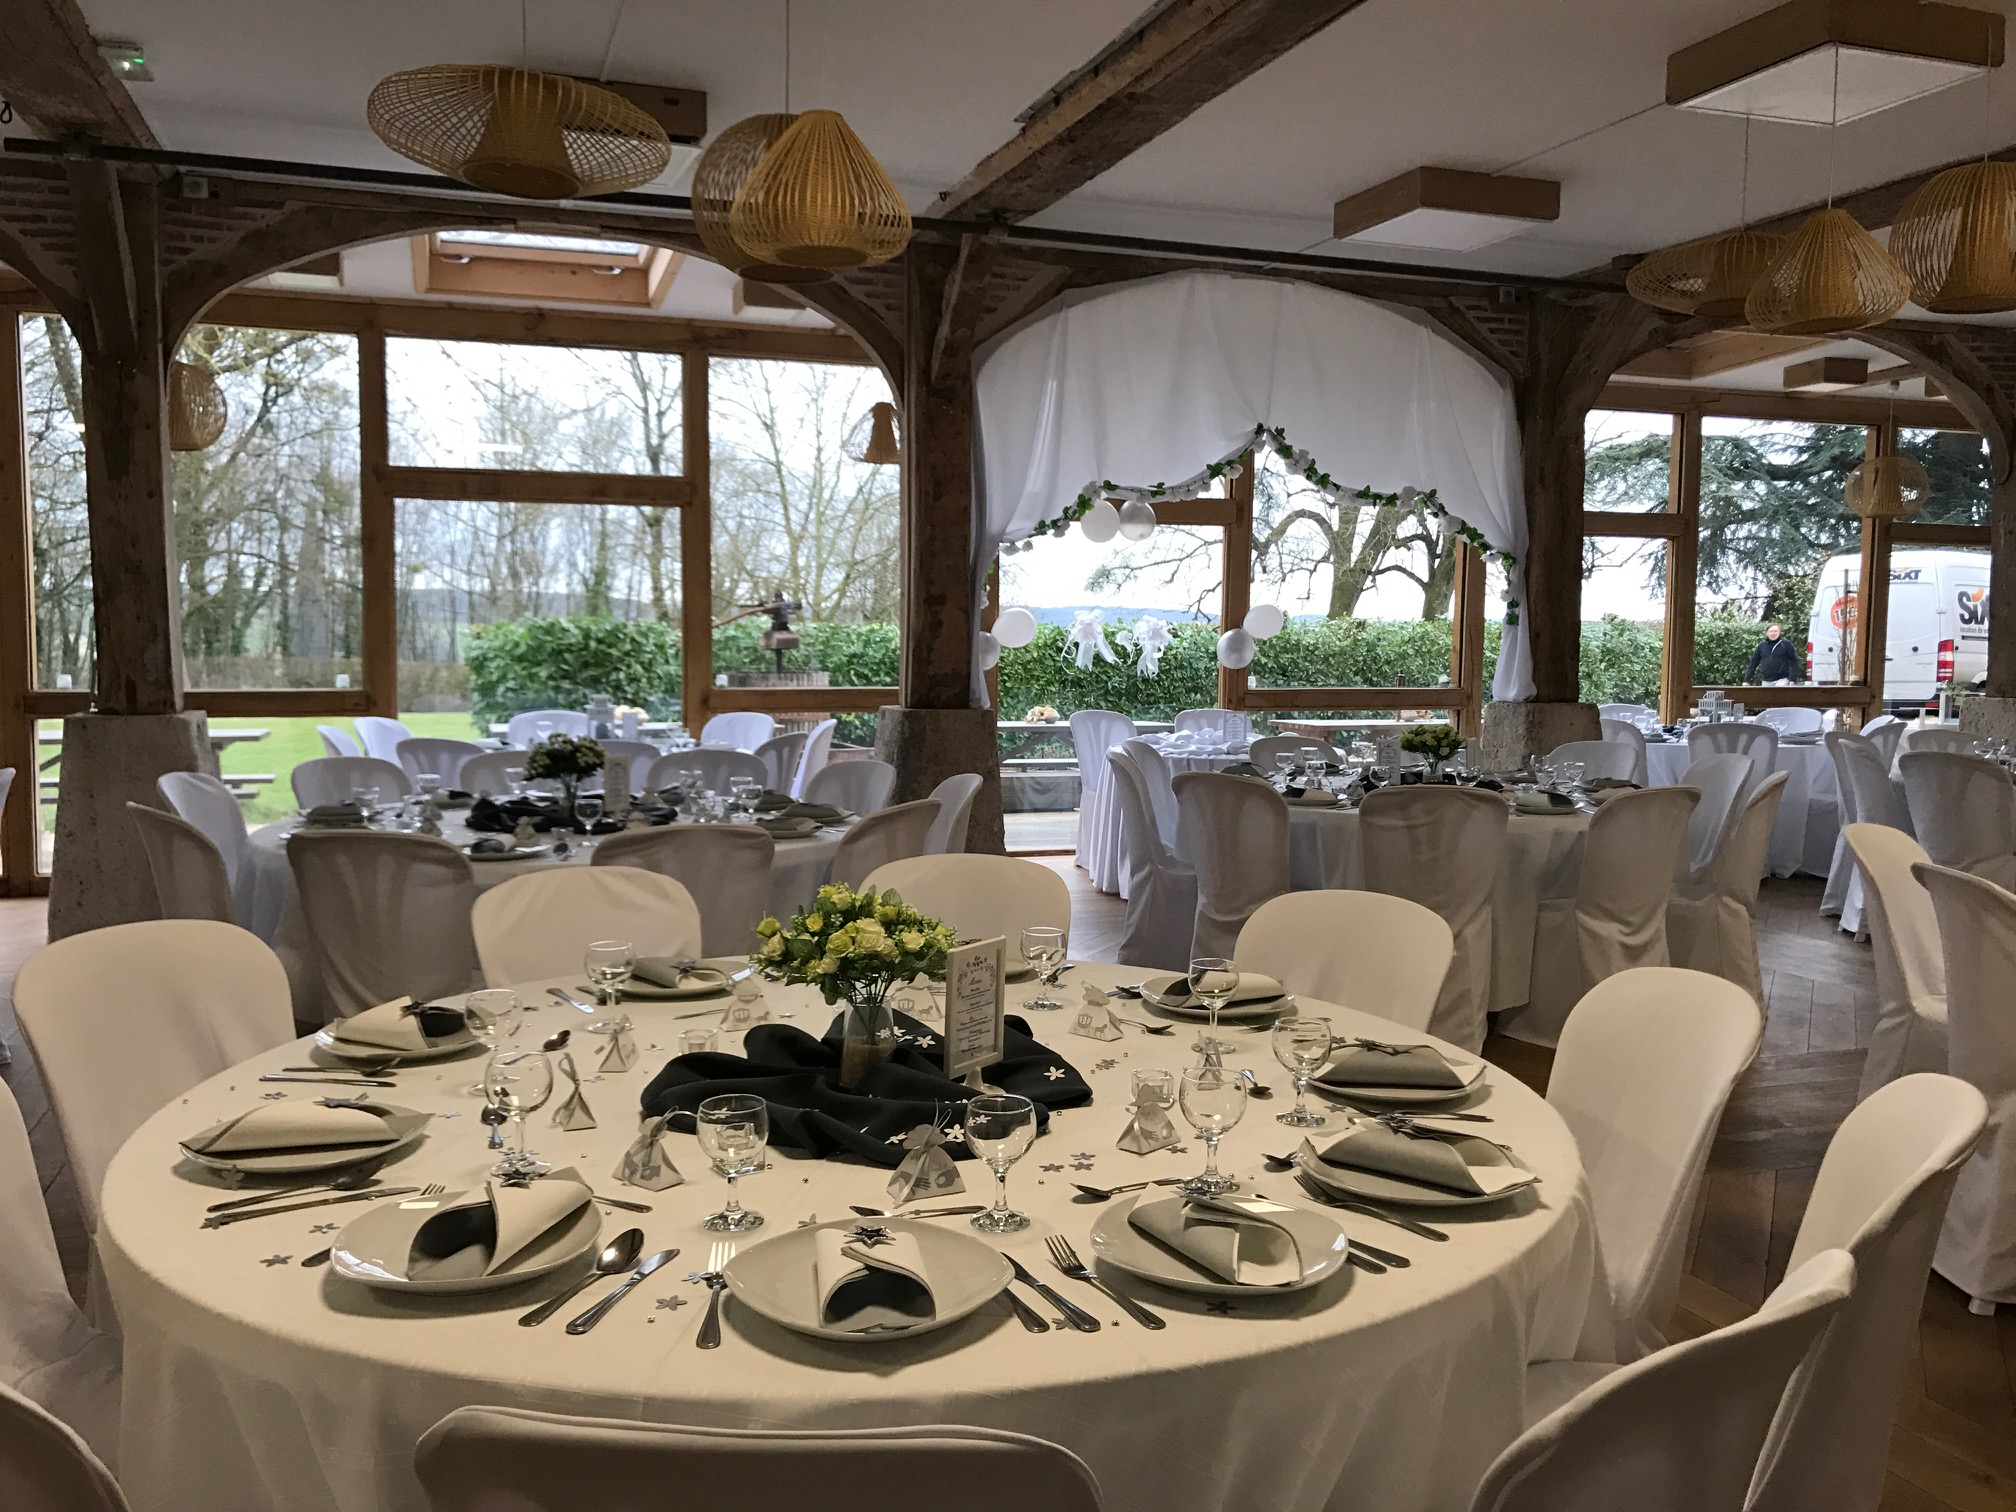 rubric __ decorations __ winter wedding __ Site 1001 salle __ IMG_6604.JPG